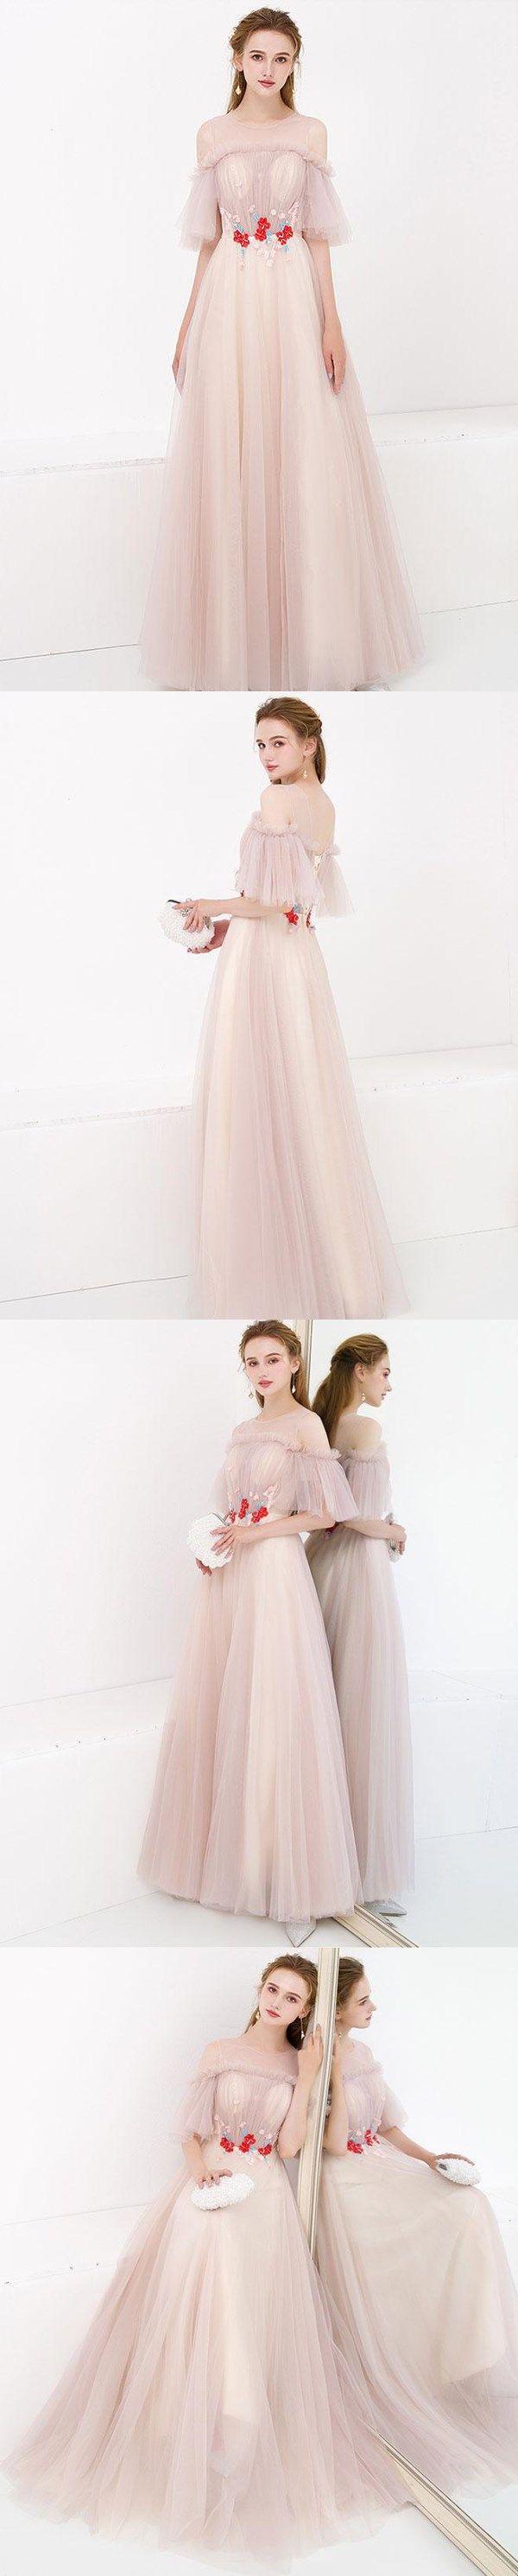 Half sleeve fairy prom dresses aline floorlength tulle long simple